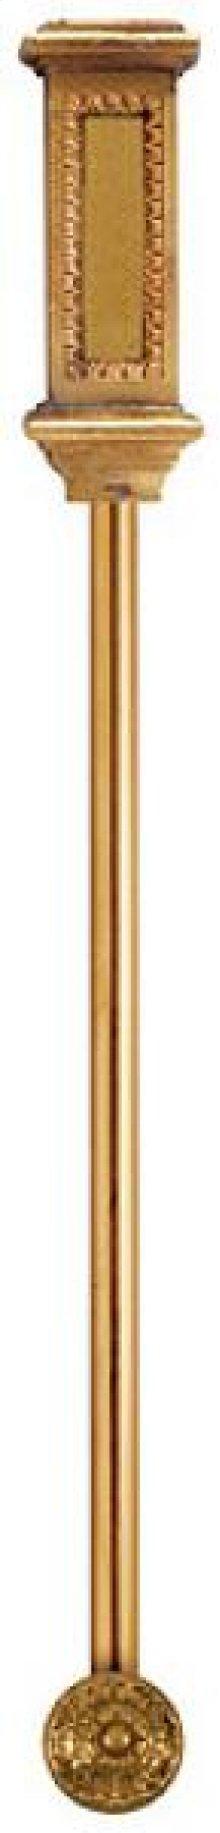 Surface Bolt Louis XVI Style